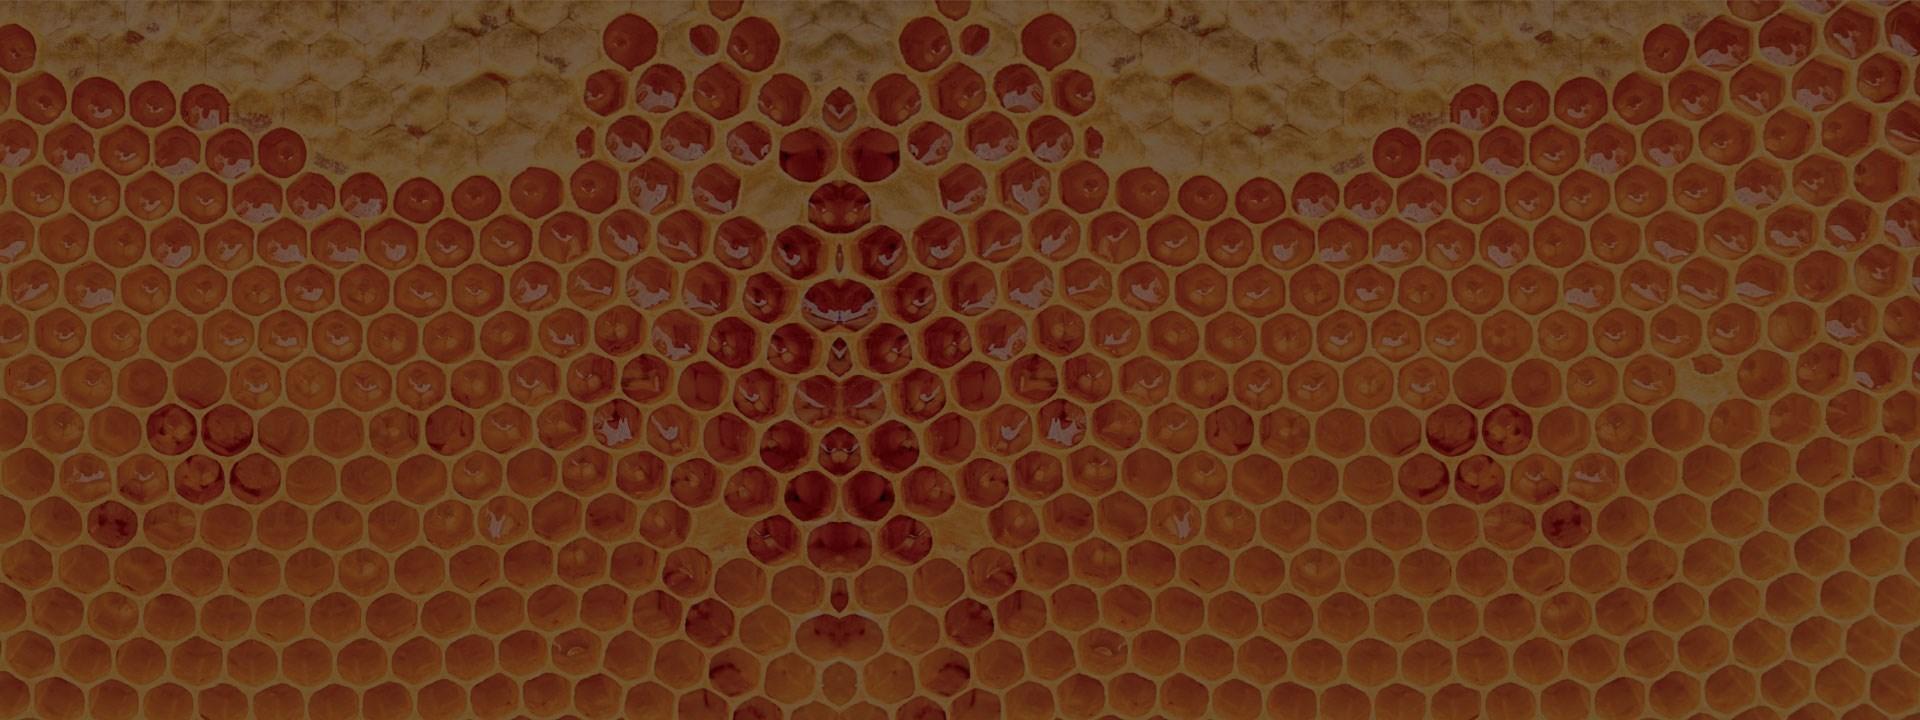 Sweeter than Honey (Video)